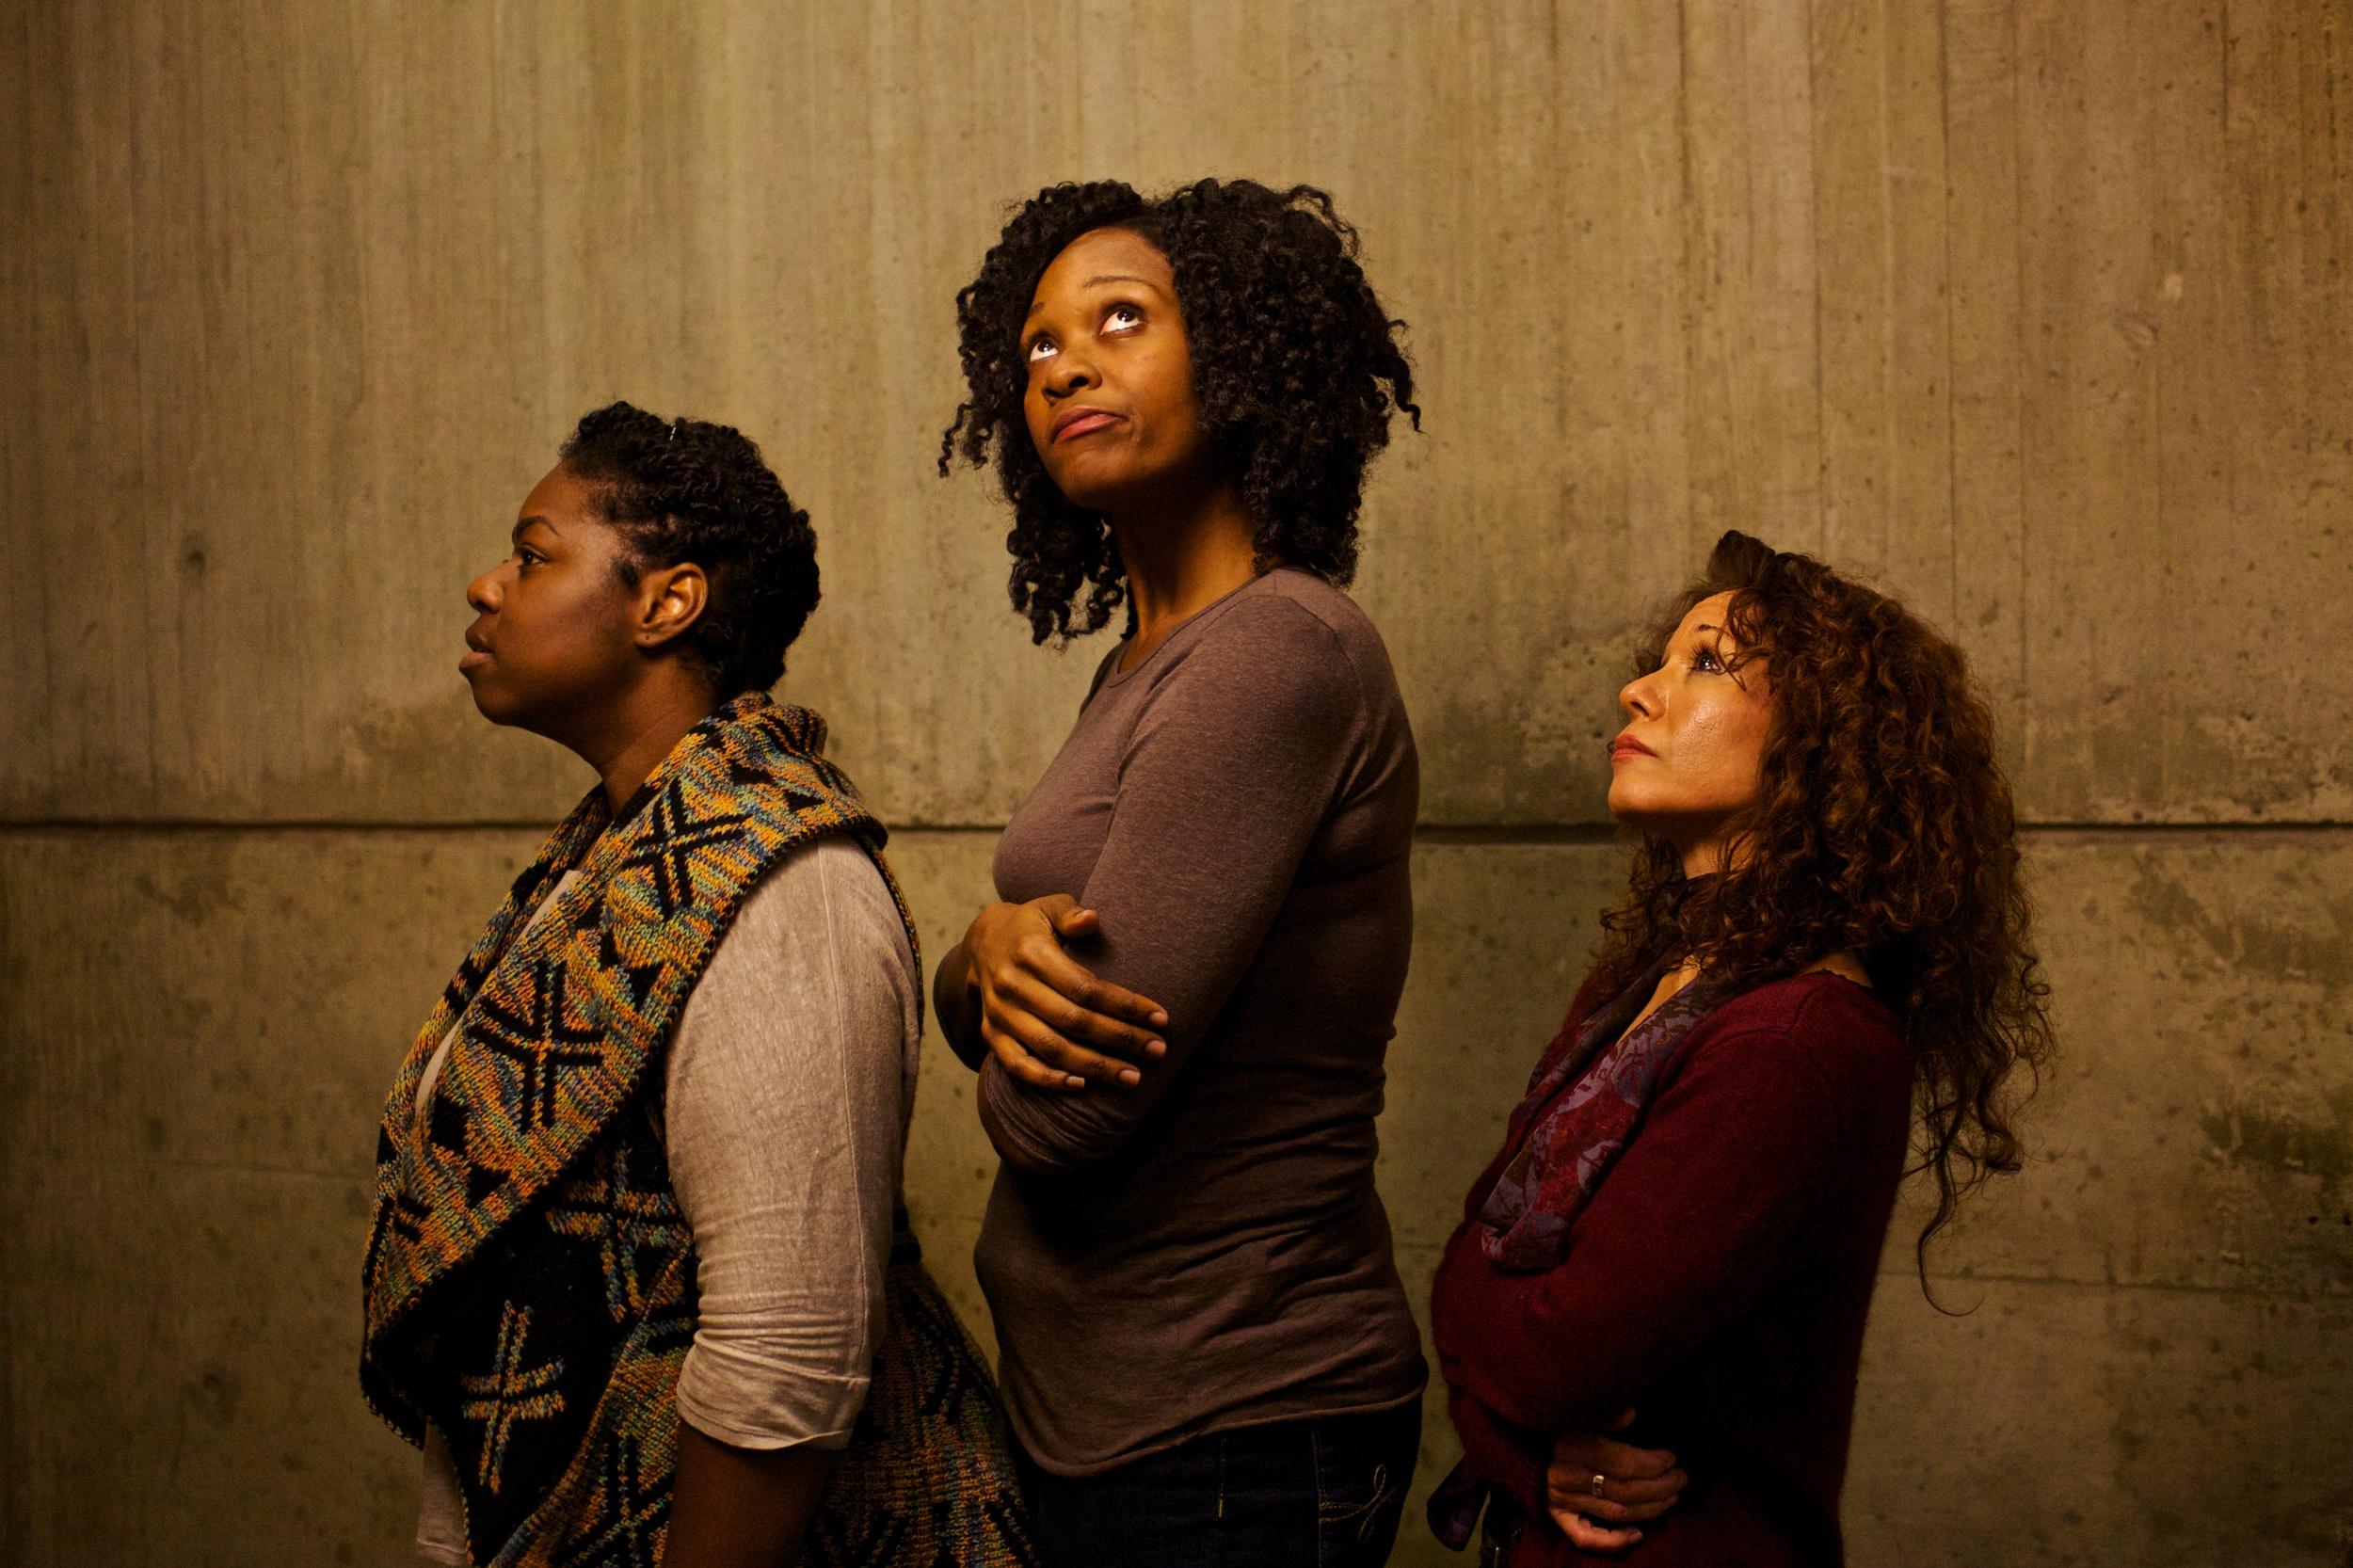 Ensemble actors Meagan Dilworth, Jasmine Rush, Majorie Tatum (left to right) Photo by Natalie Herbert